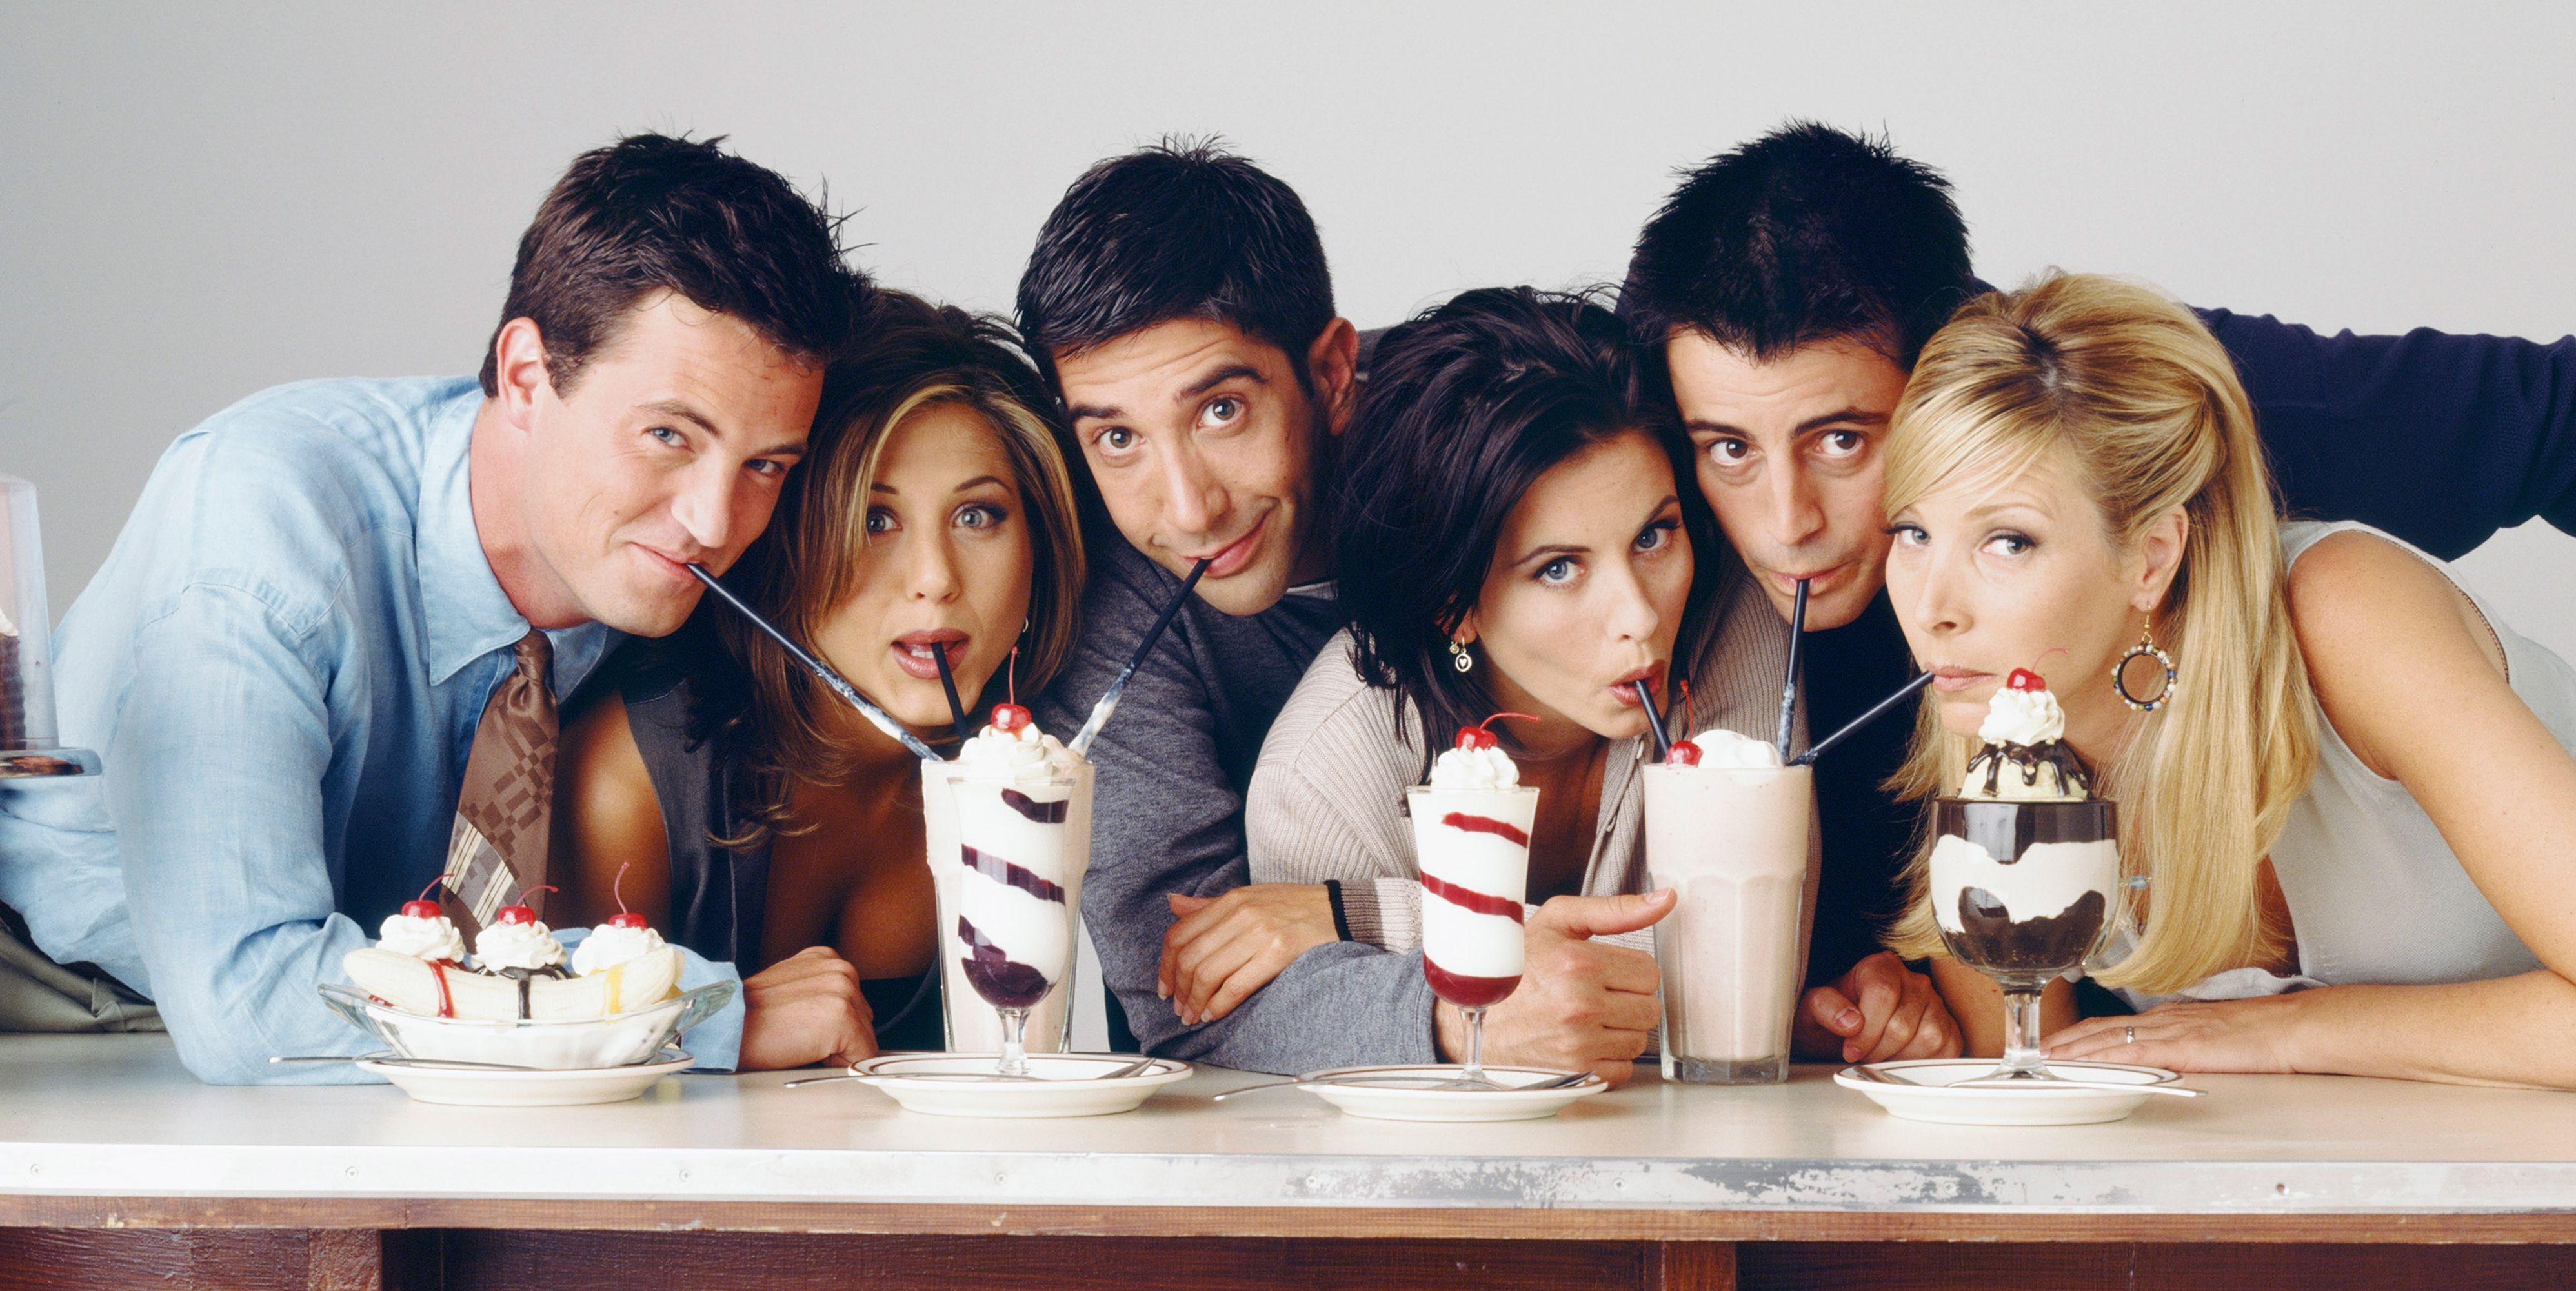 'Friends' cast drinking milkshakes